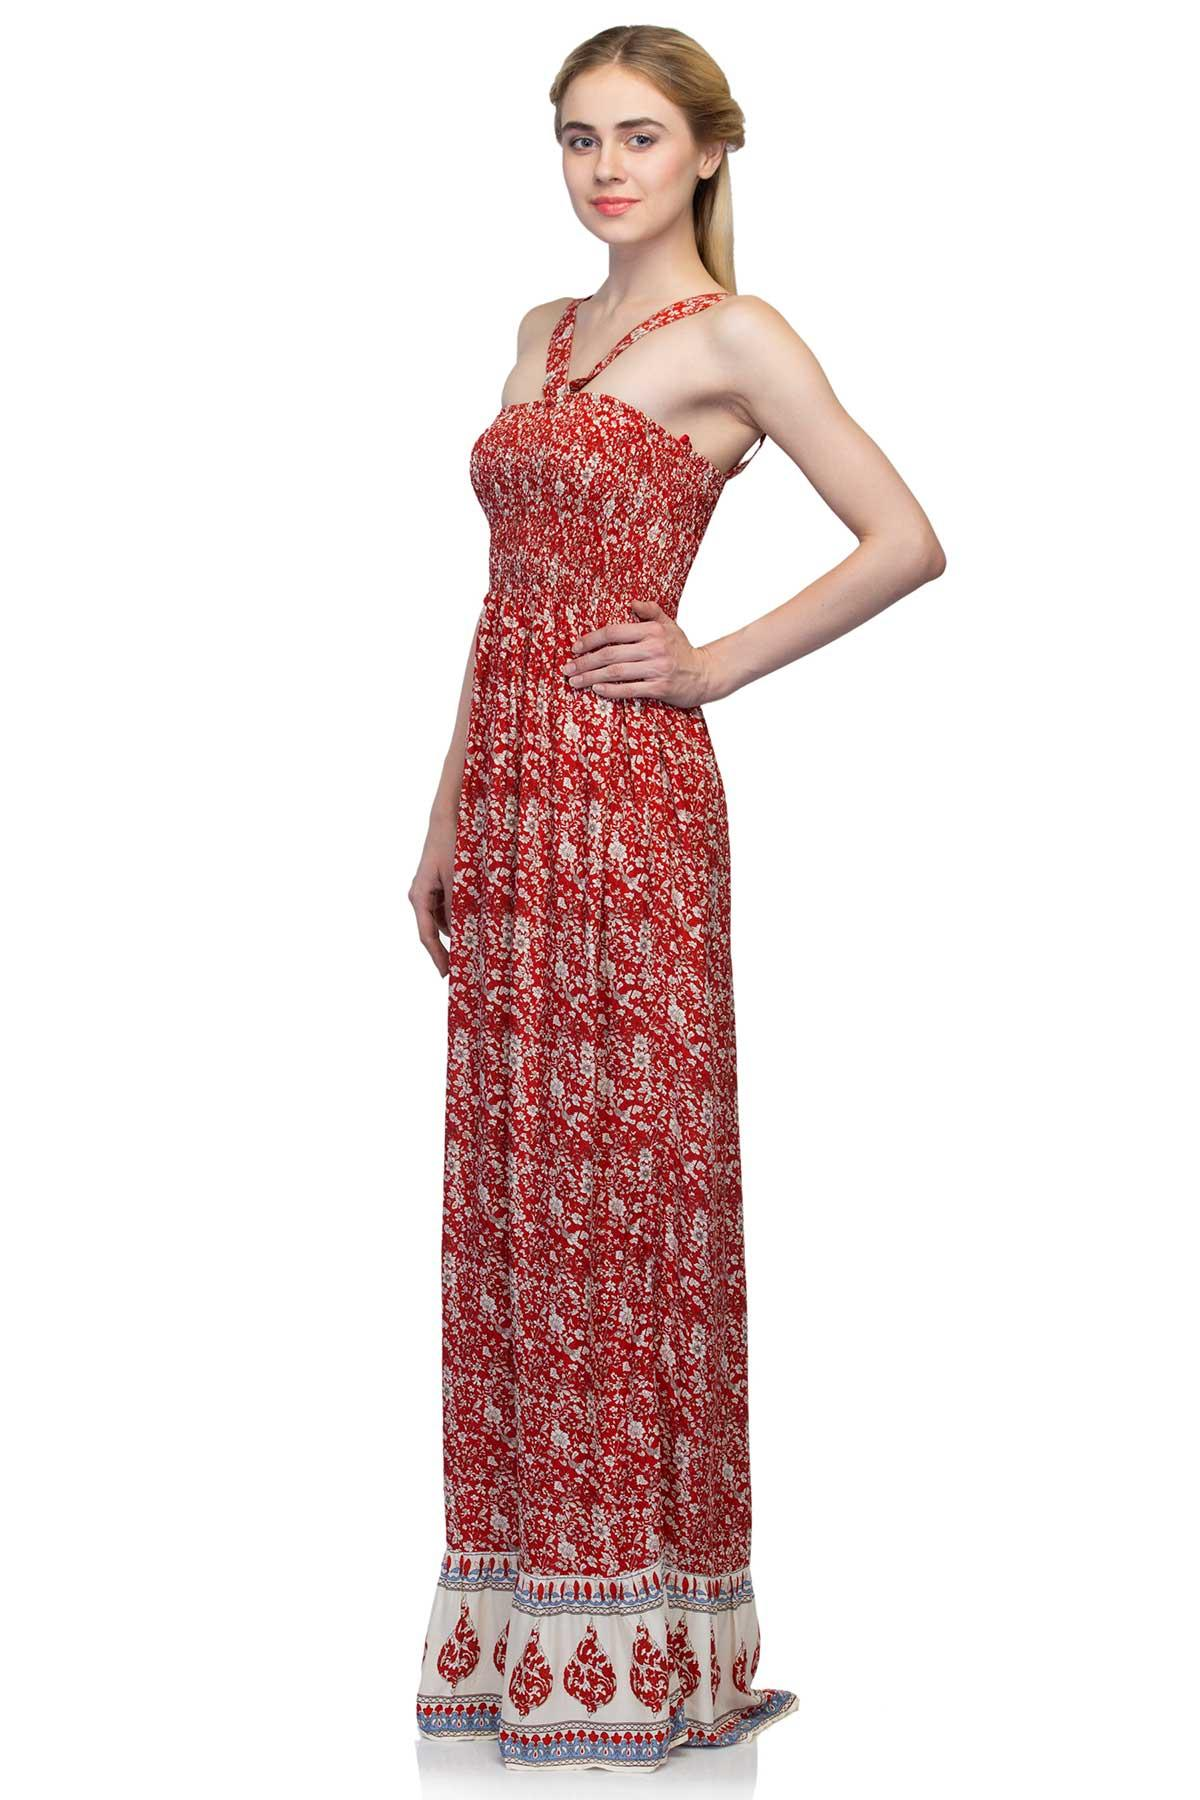 f95f3e69212 ... rent Atmosphere clothing Long Tube Dress Red   White dress for ...